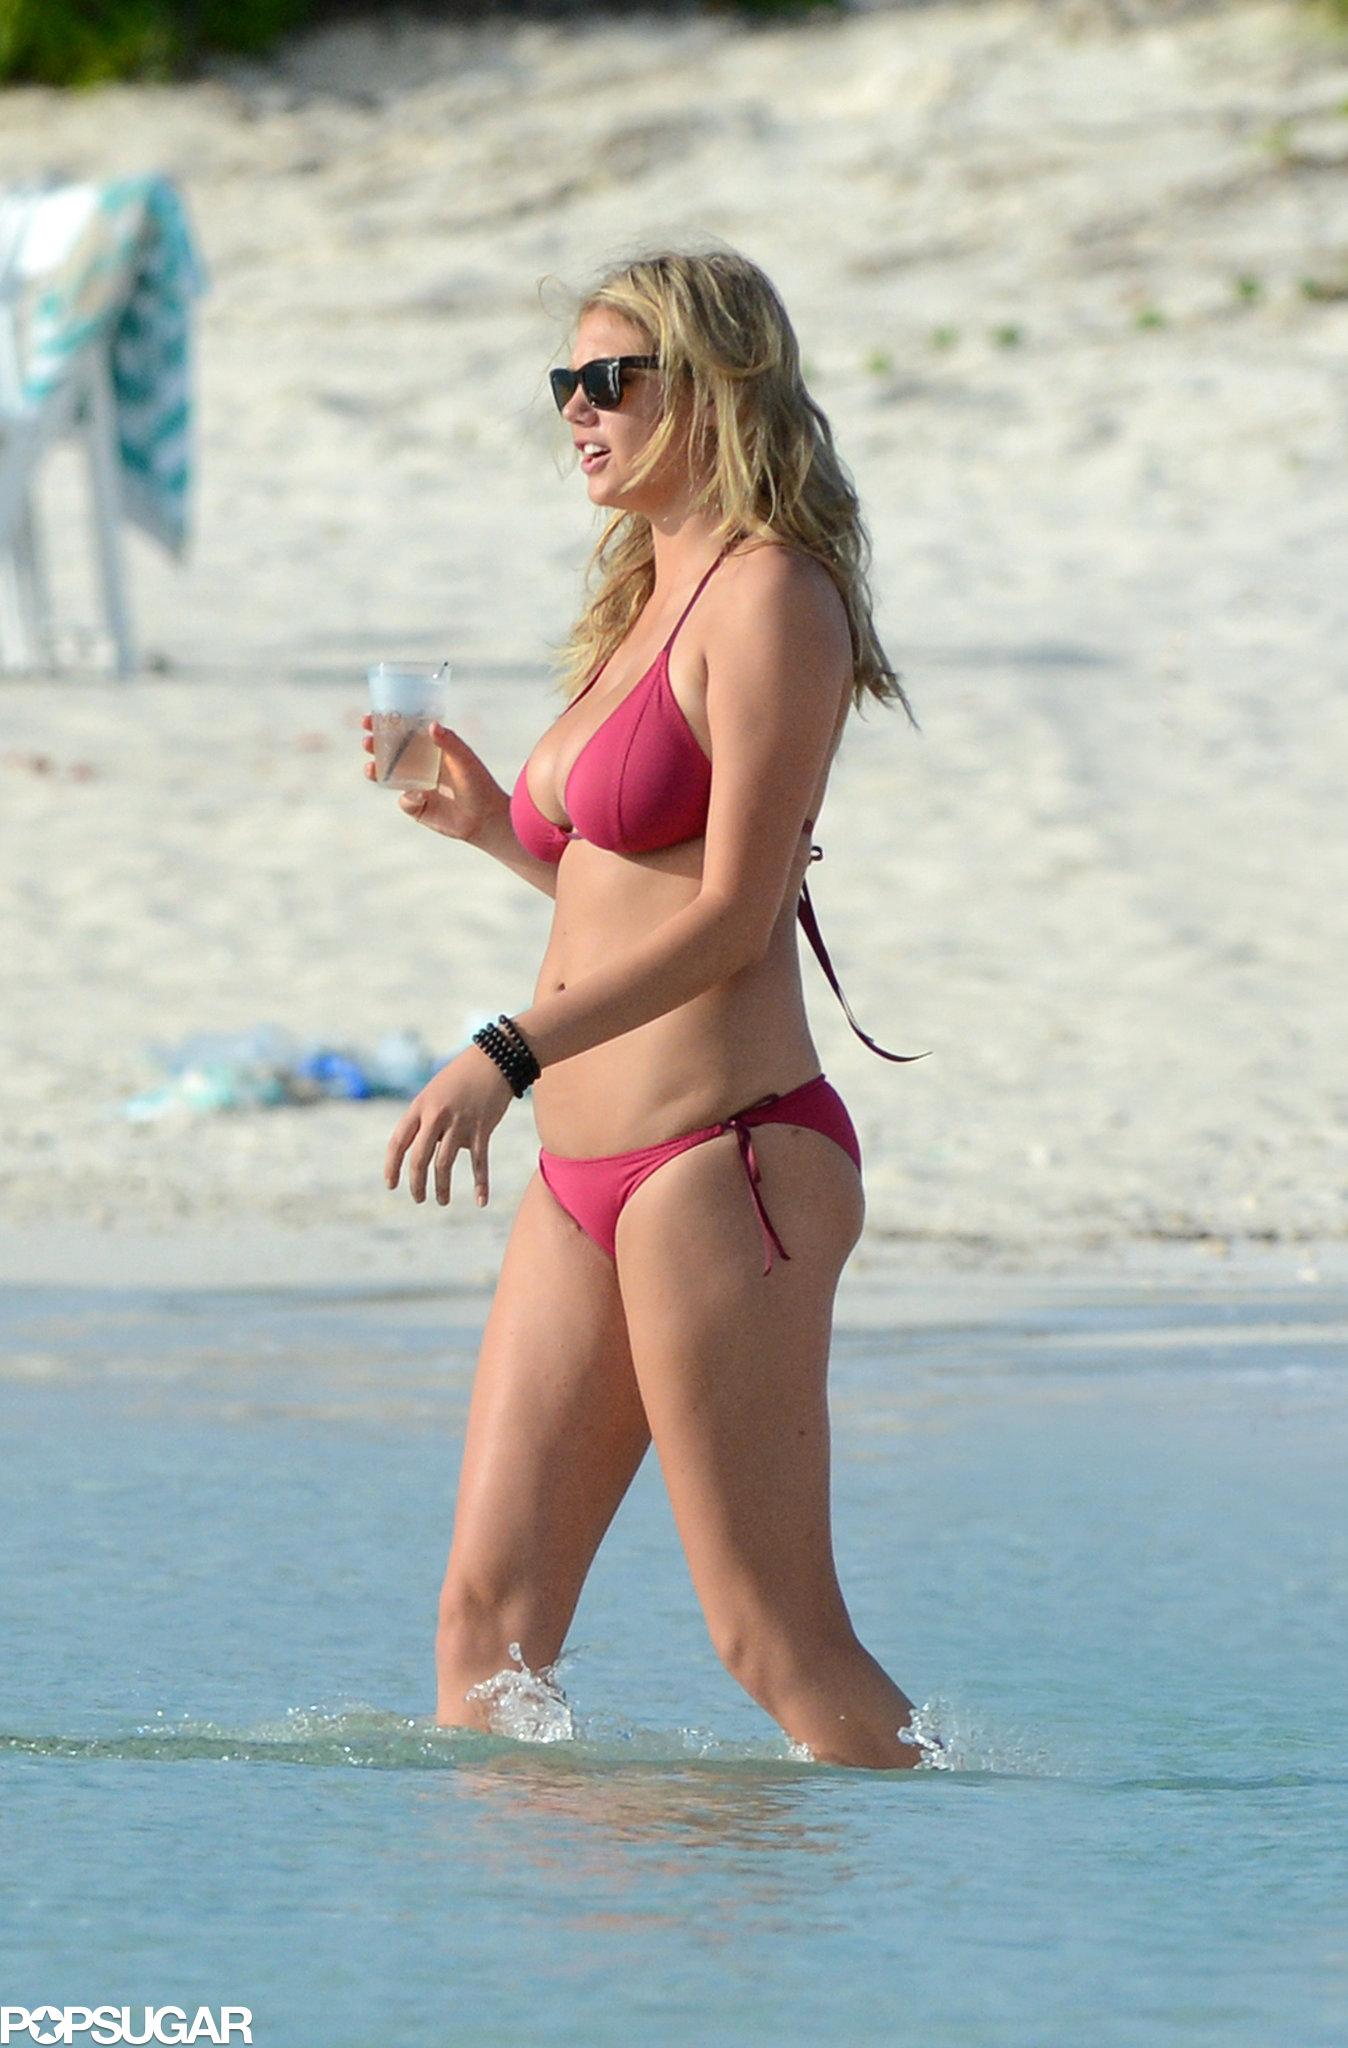 Kate Upton showed off her bikini body.